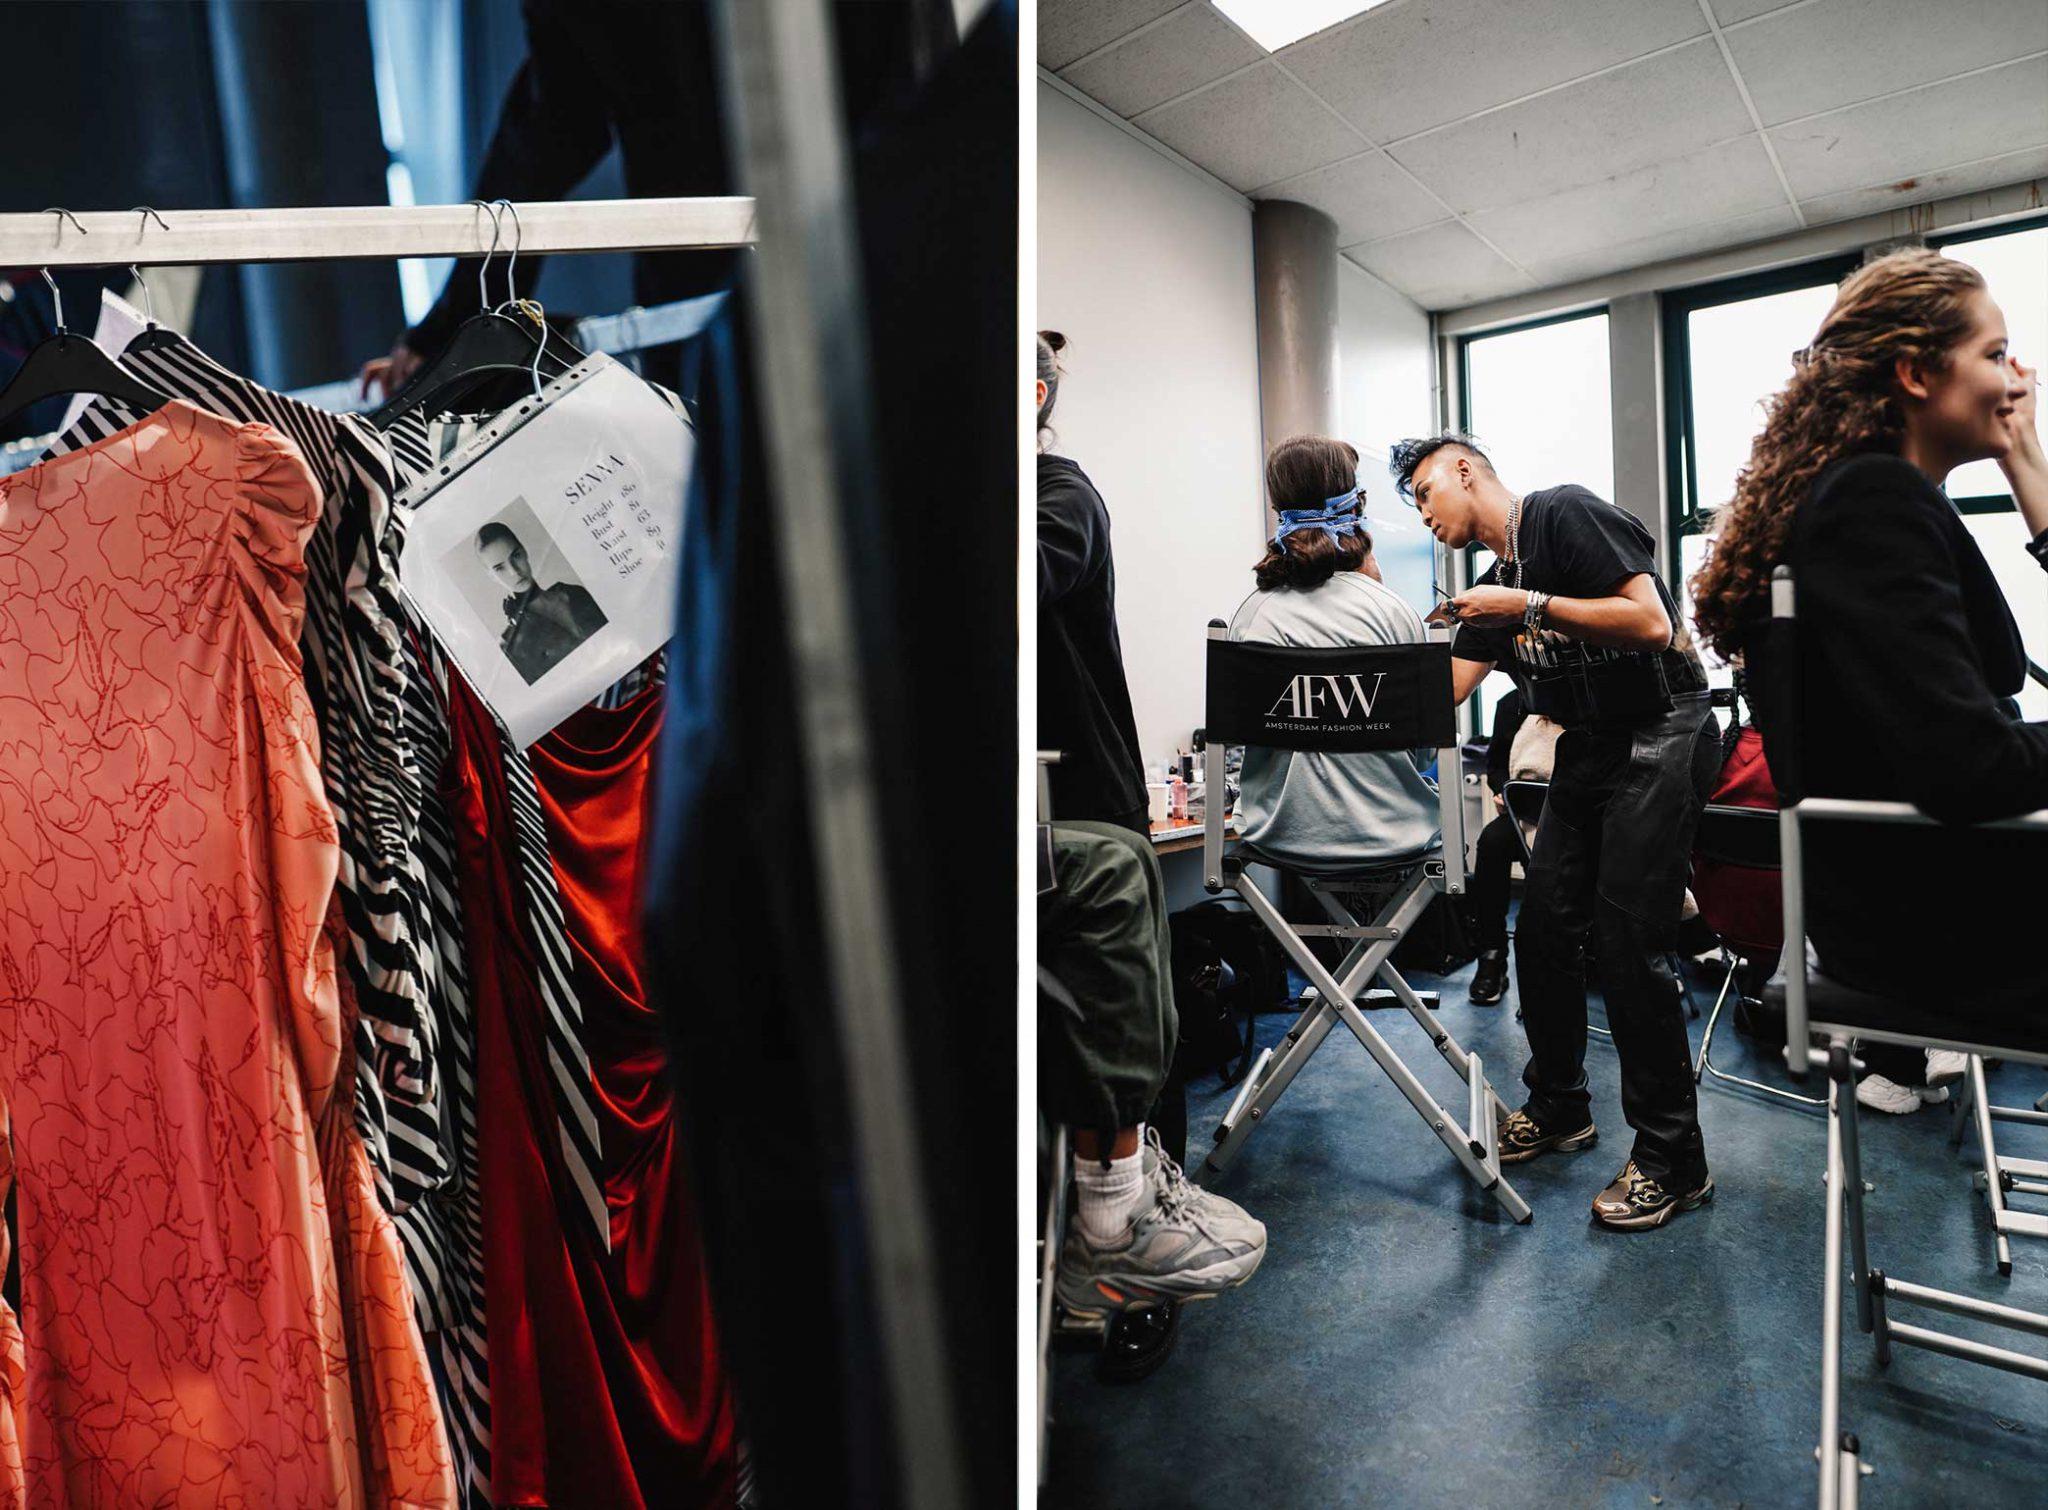 Ilsoo_van_Dijk_Ilsoovandijk_AFW_Toral_Backstage_Amsterdam_Fashion_week_2020_-scaled_7